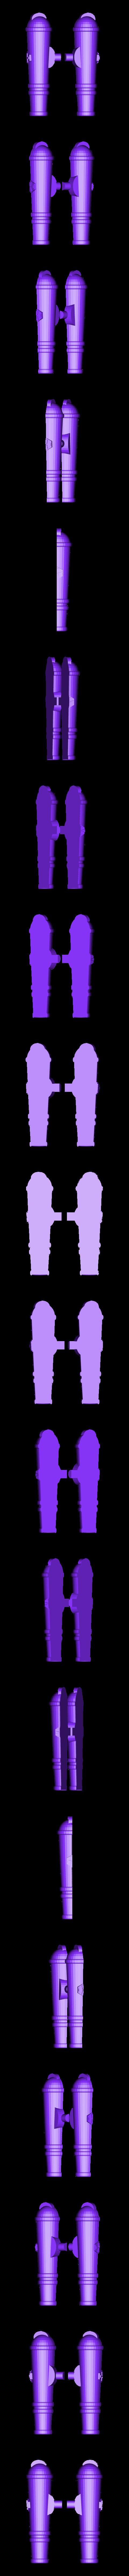 Split_Wrist_Cannon.stl Download free STL file Modular Mech SteamPunk • Design to 3D print, mrhers2